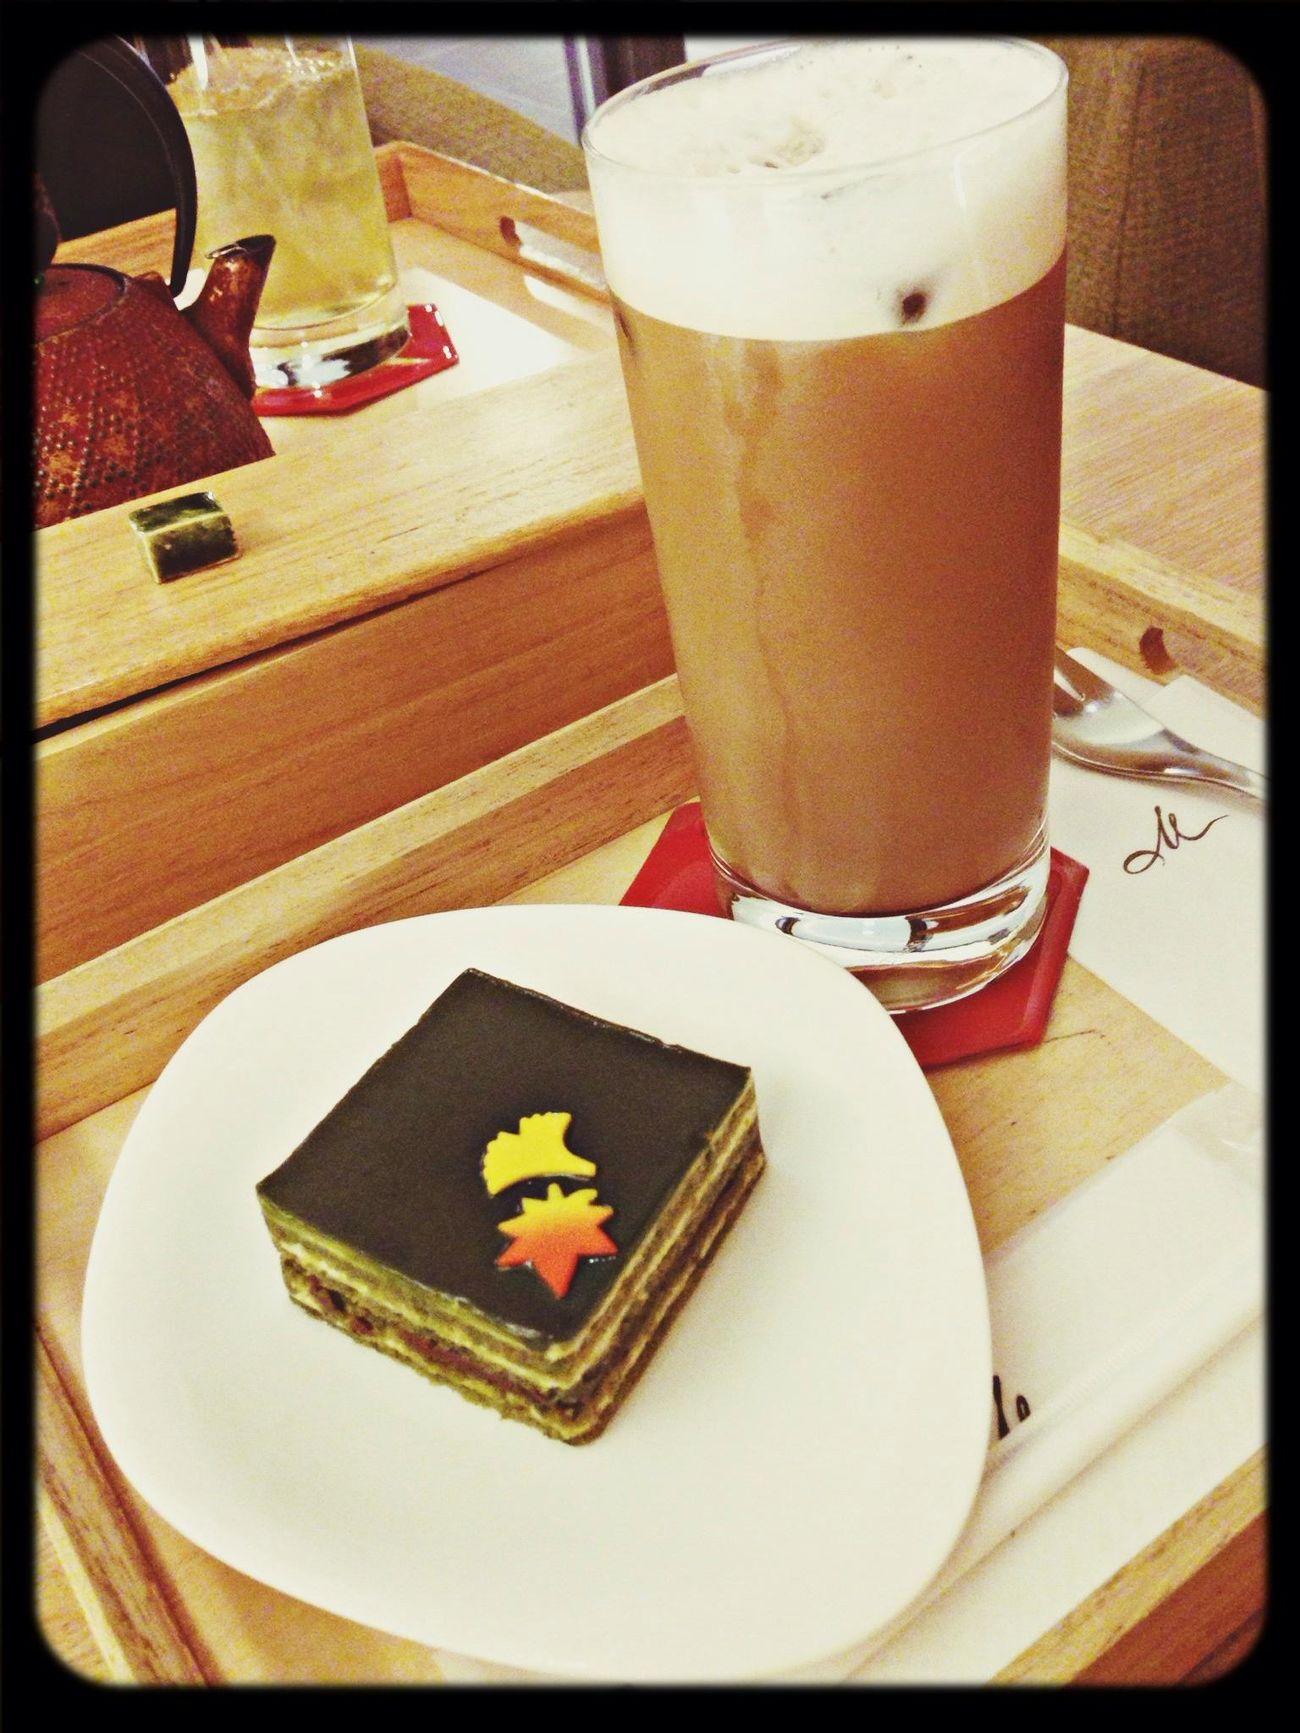 Kyoto Greentea Cake Japanese Sweets Caffì¬ Au Lait